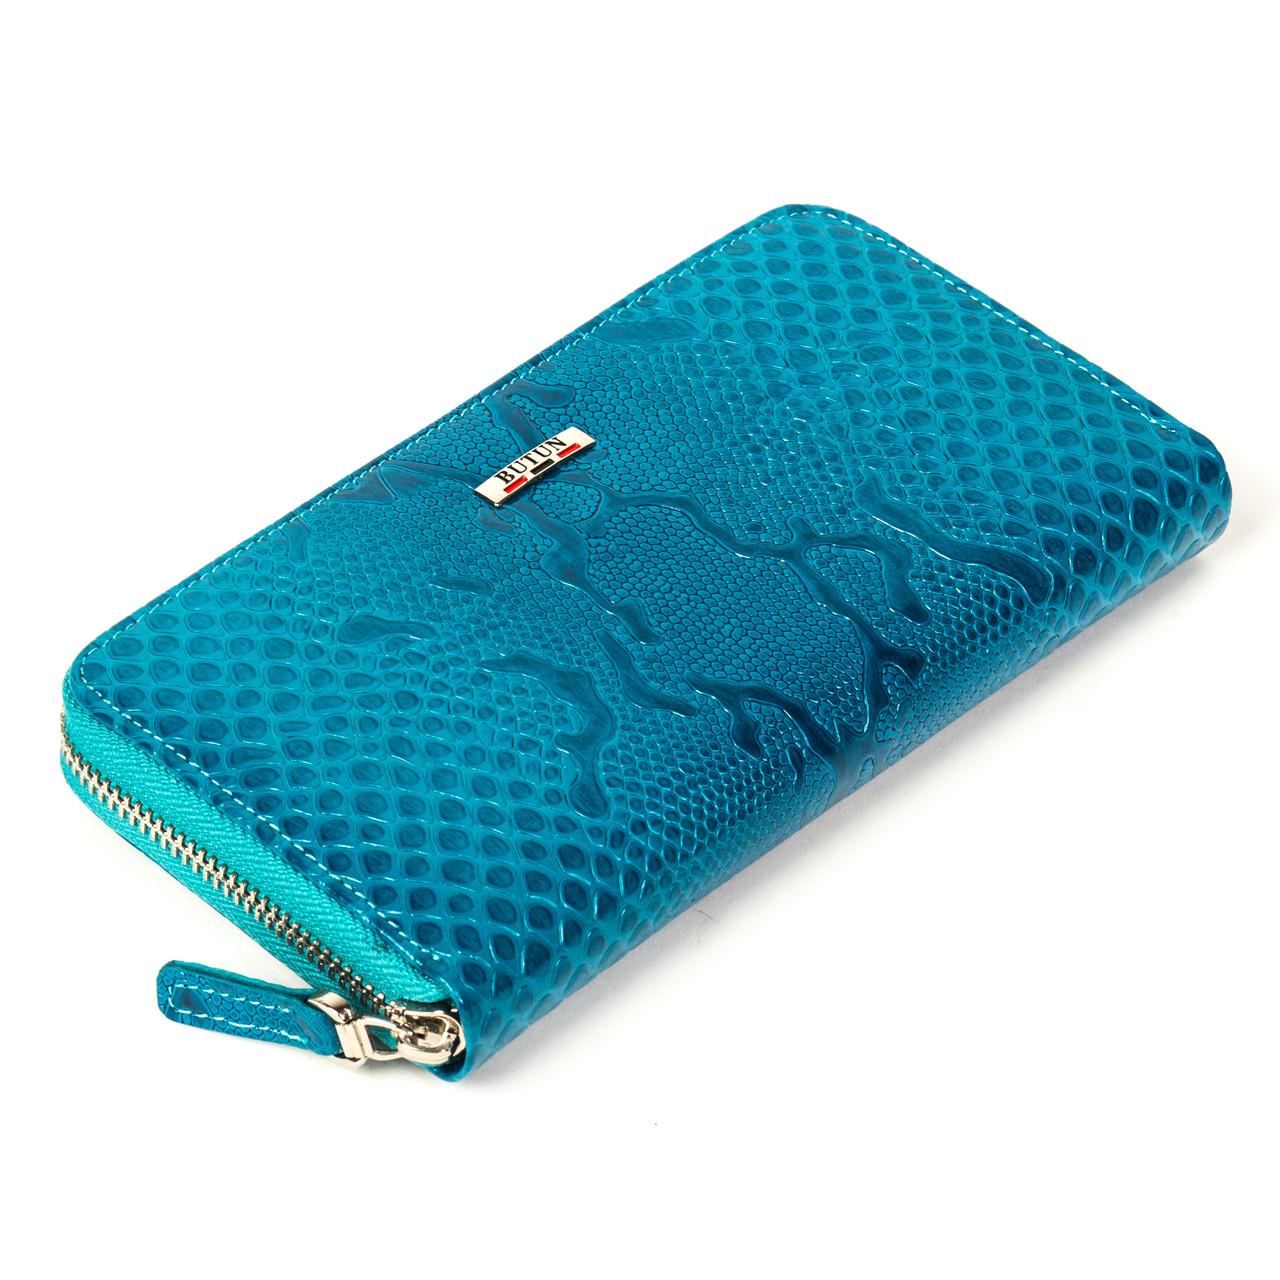 Женский кошелек Butun 639-008-037 кожаный бирюзовый